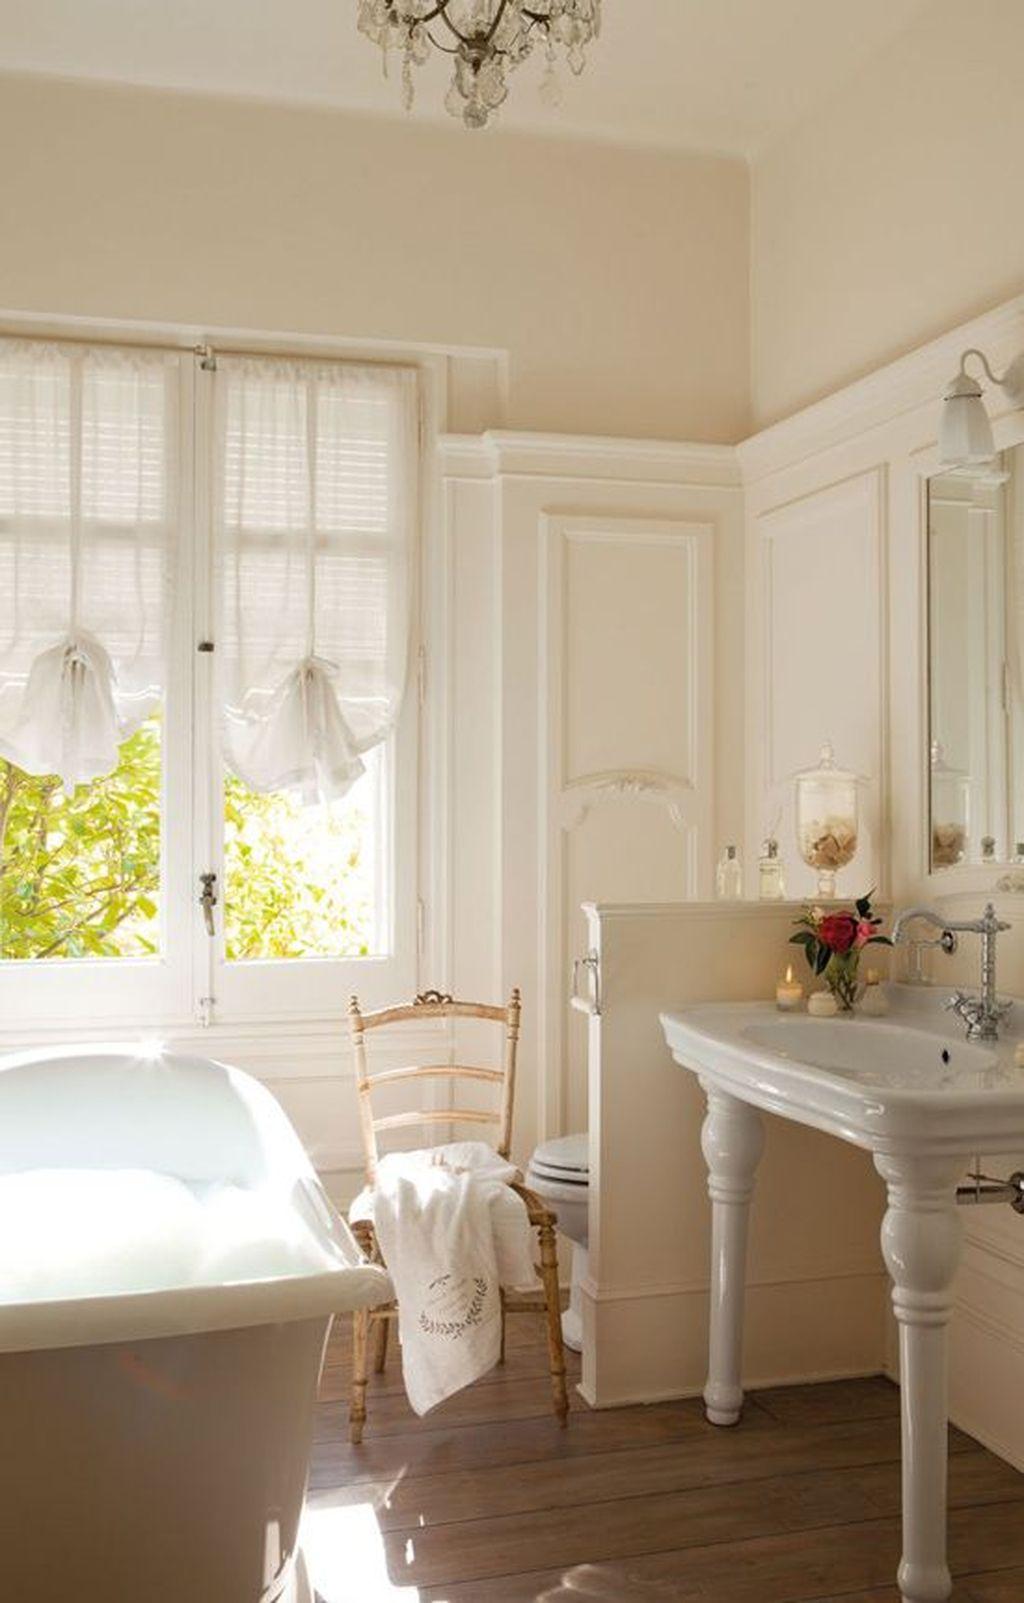 Romantic And Elegant Bathroom Design Ideas With Chandeliers 77 Homedecorish